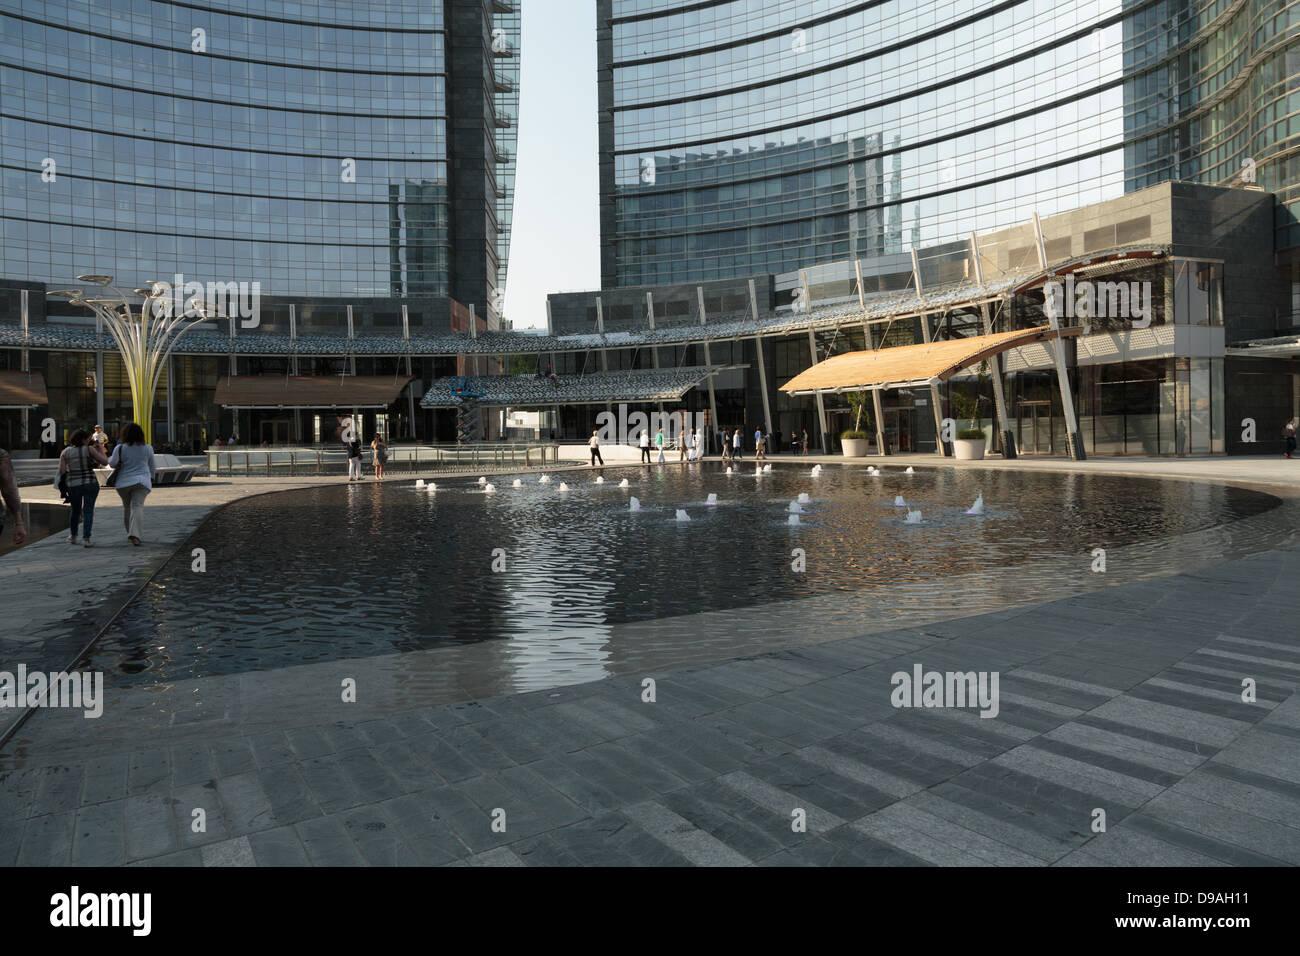 Milan, Porta Nuova, Gae Aulenti square,Lombardy, Italy - Stock Image